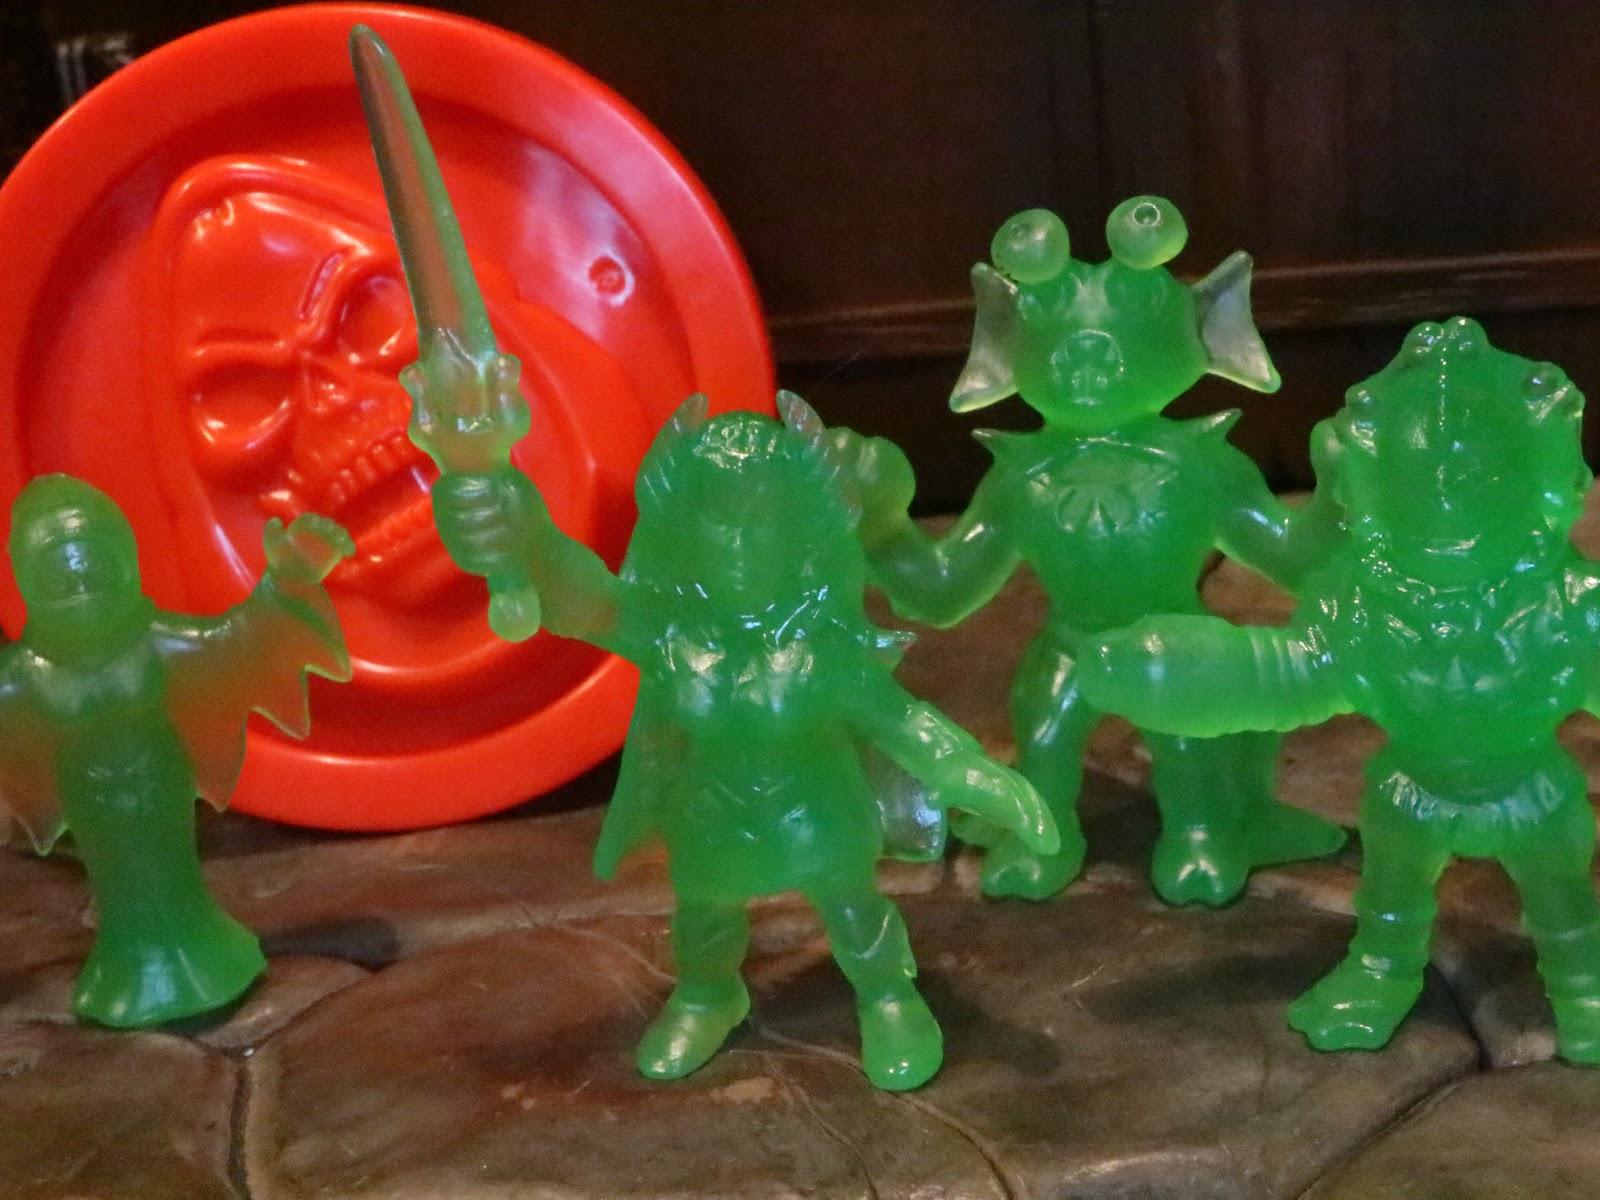 Green Slime Wave 2 Keshi Figures MOTU Masters of the Universe M.U.S.C.L.E